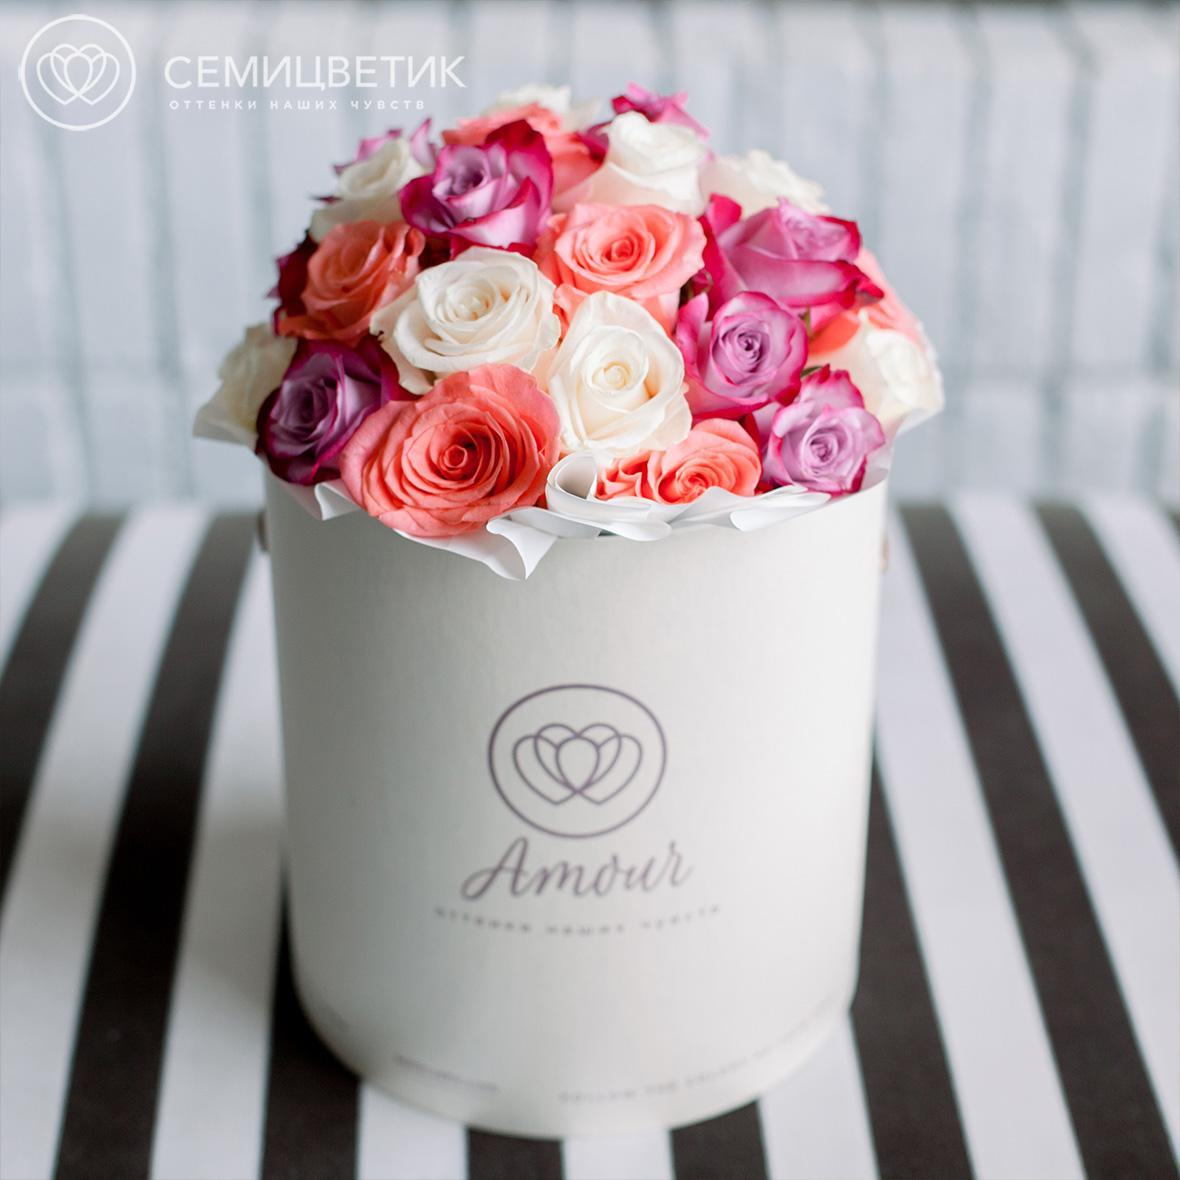 Шляпная коробка Amour с розами микс фото